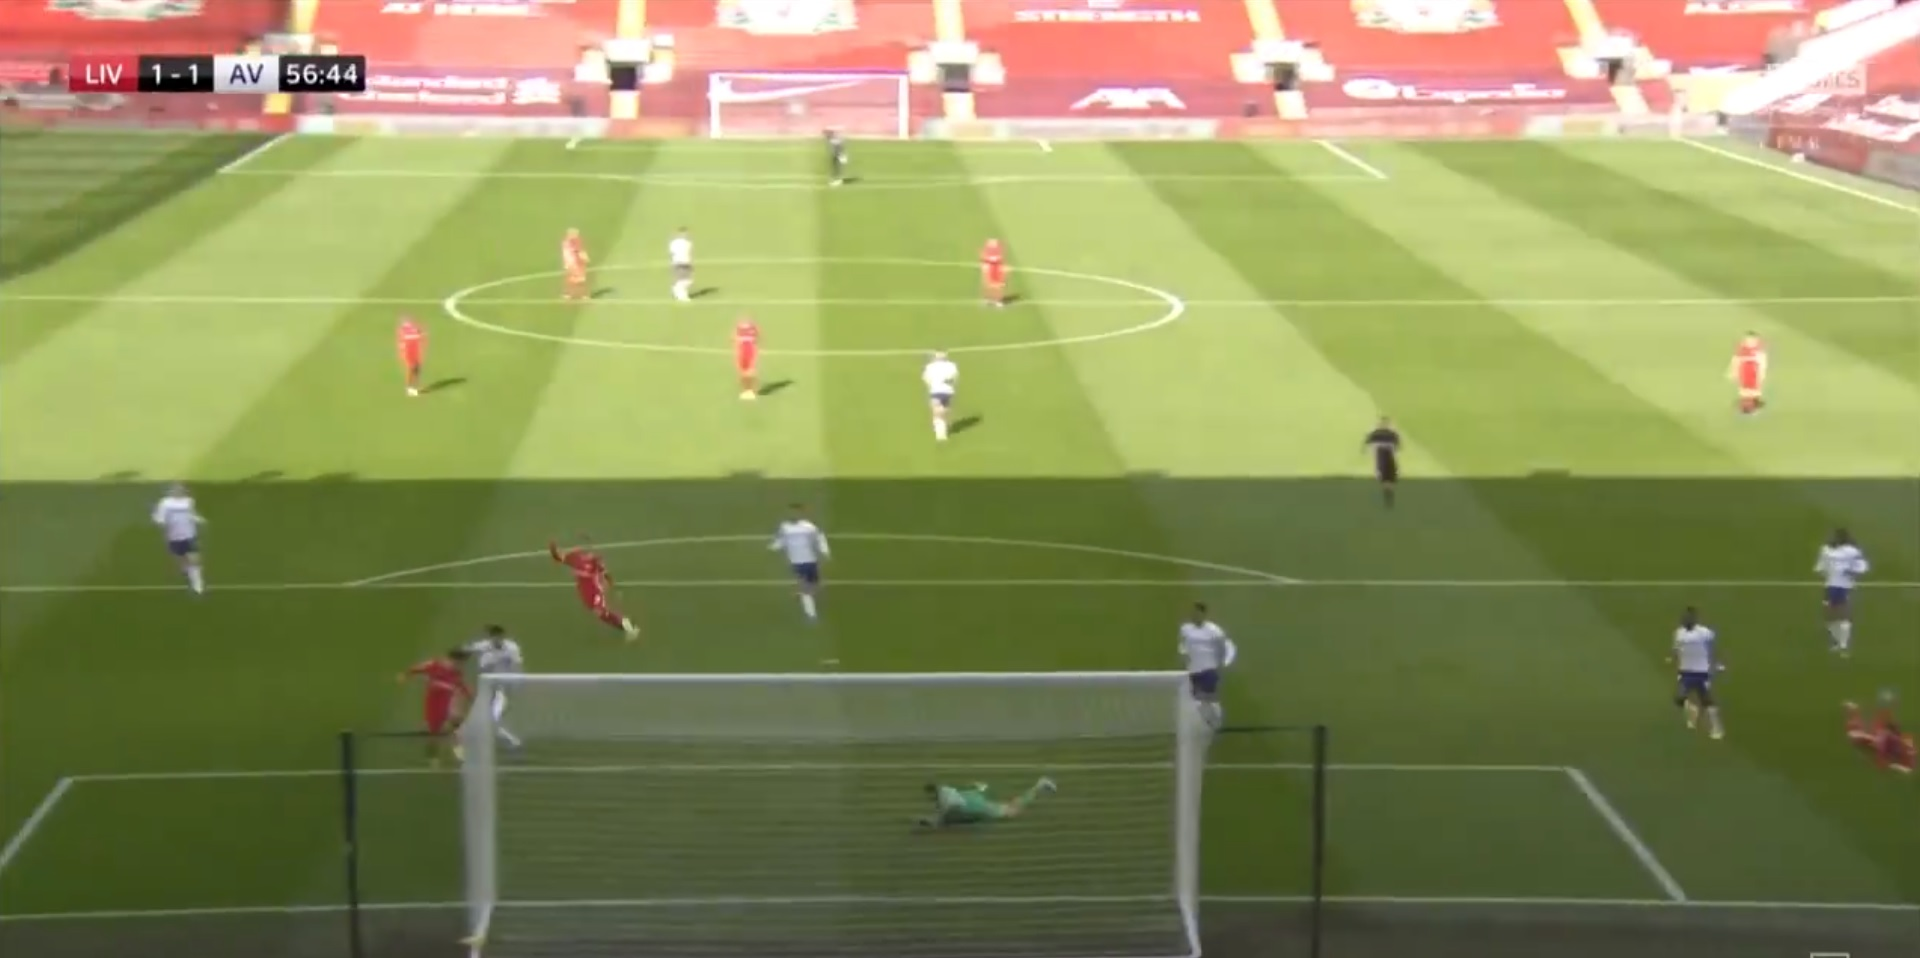 (Video) Salah pounces on loose ball for Villa equaliser as keeper palms away Robertson scorcher